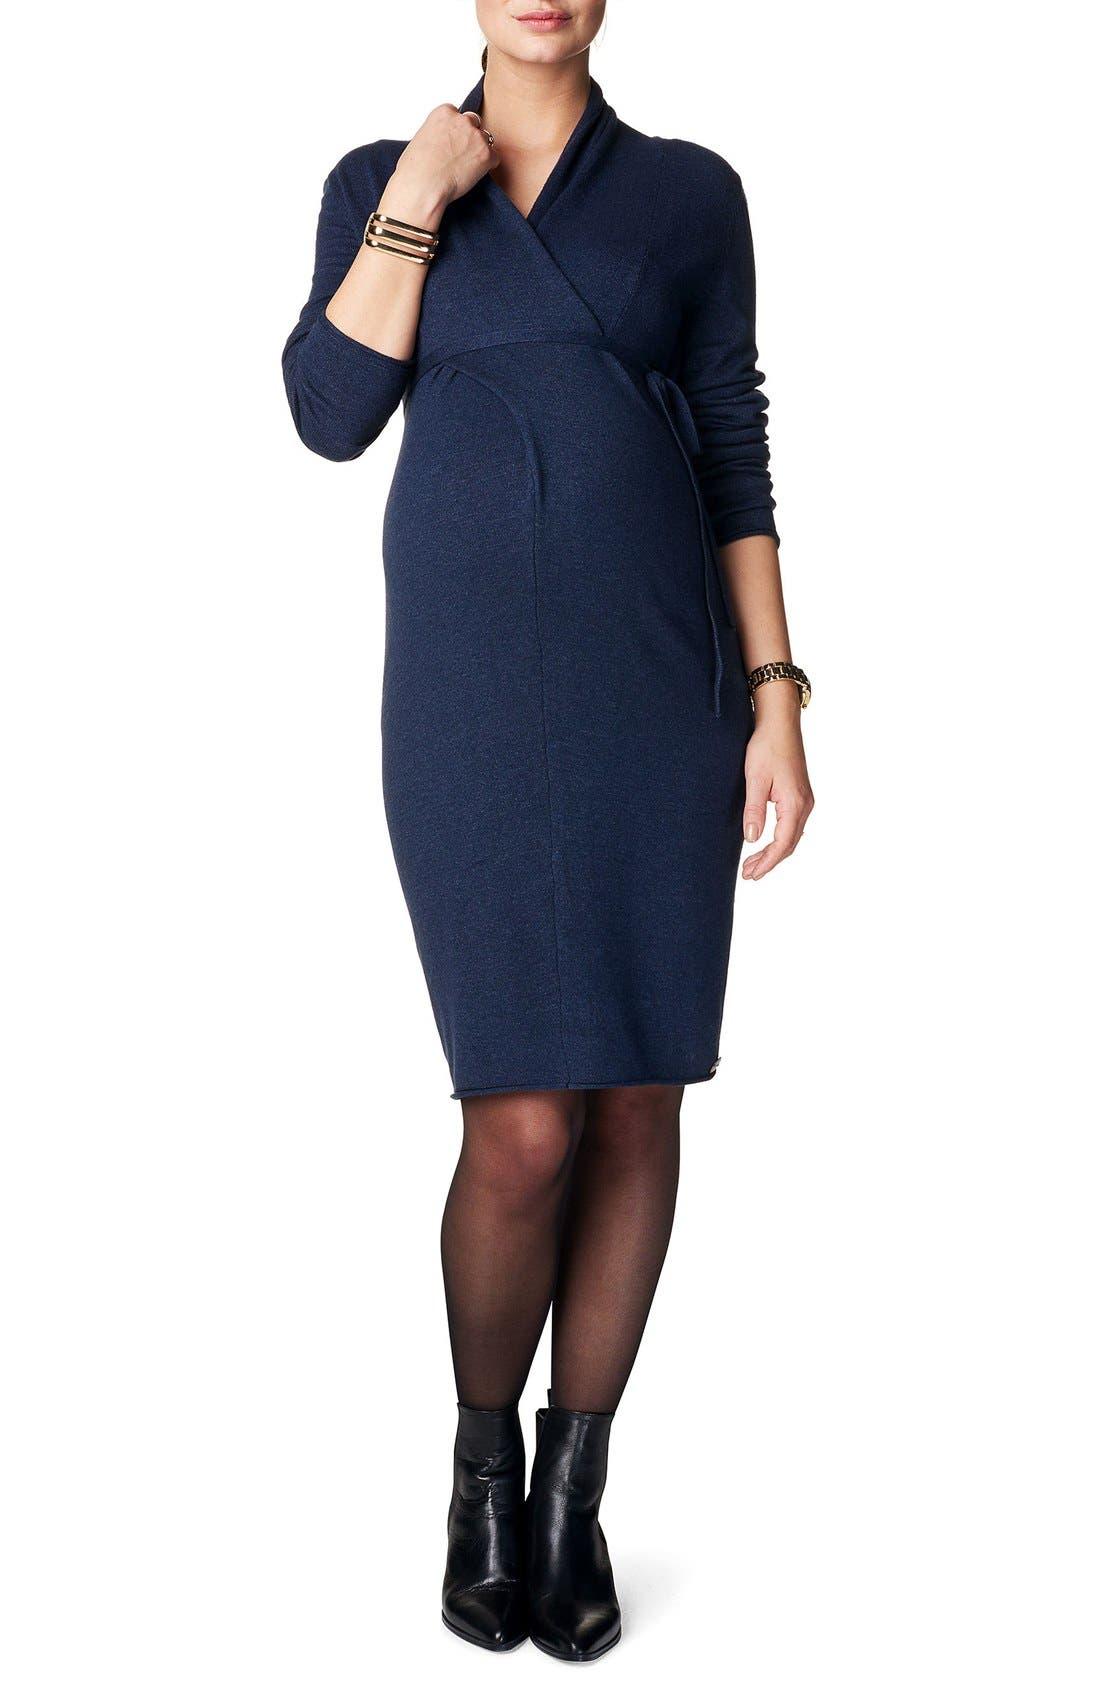 Noppies Zara Knit Maternity Sweater Dress